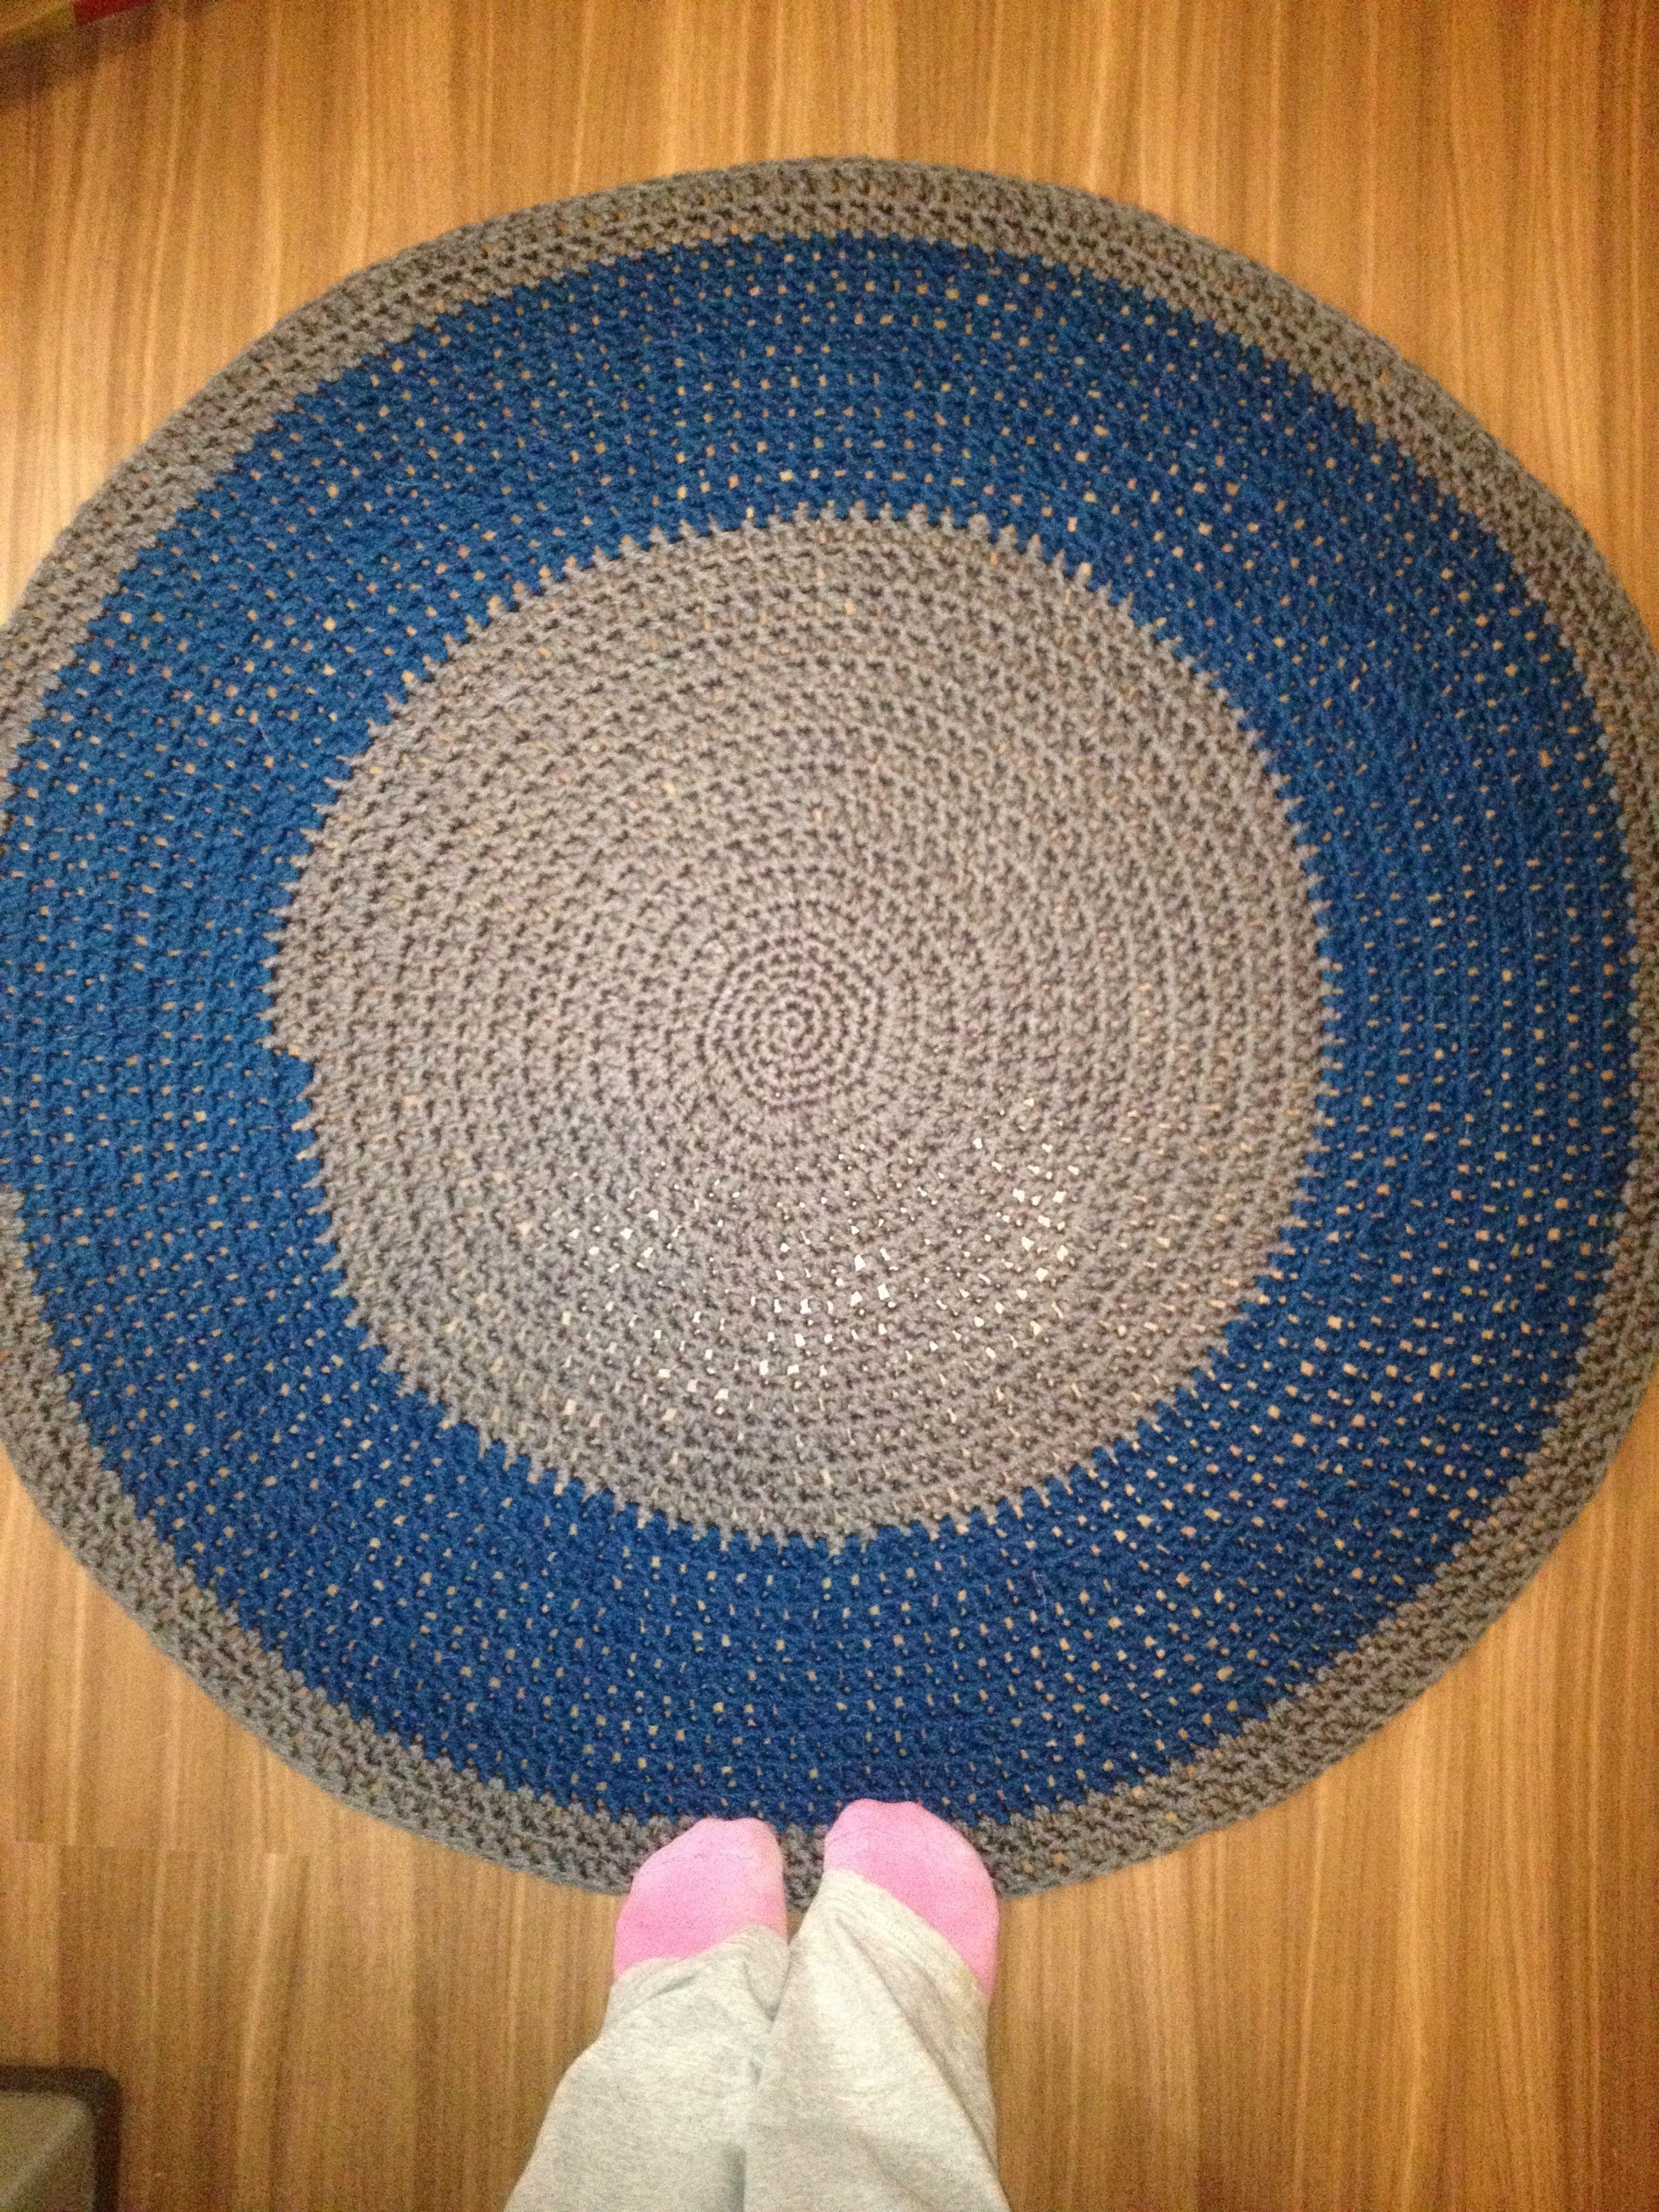 Mi primera alfombra a ganchillo!! My first rug on crochet!!! Yeiiiii Flory Isea!